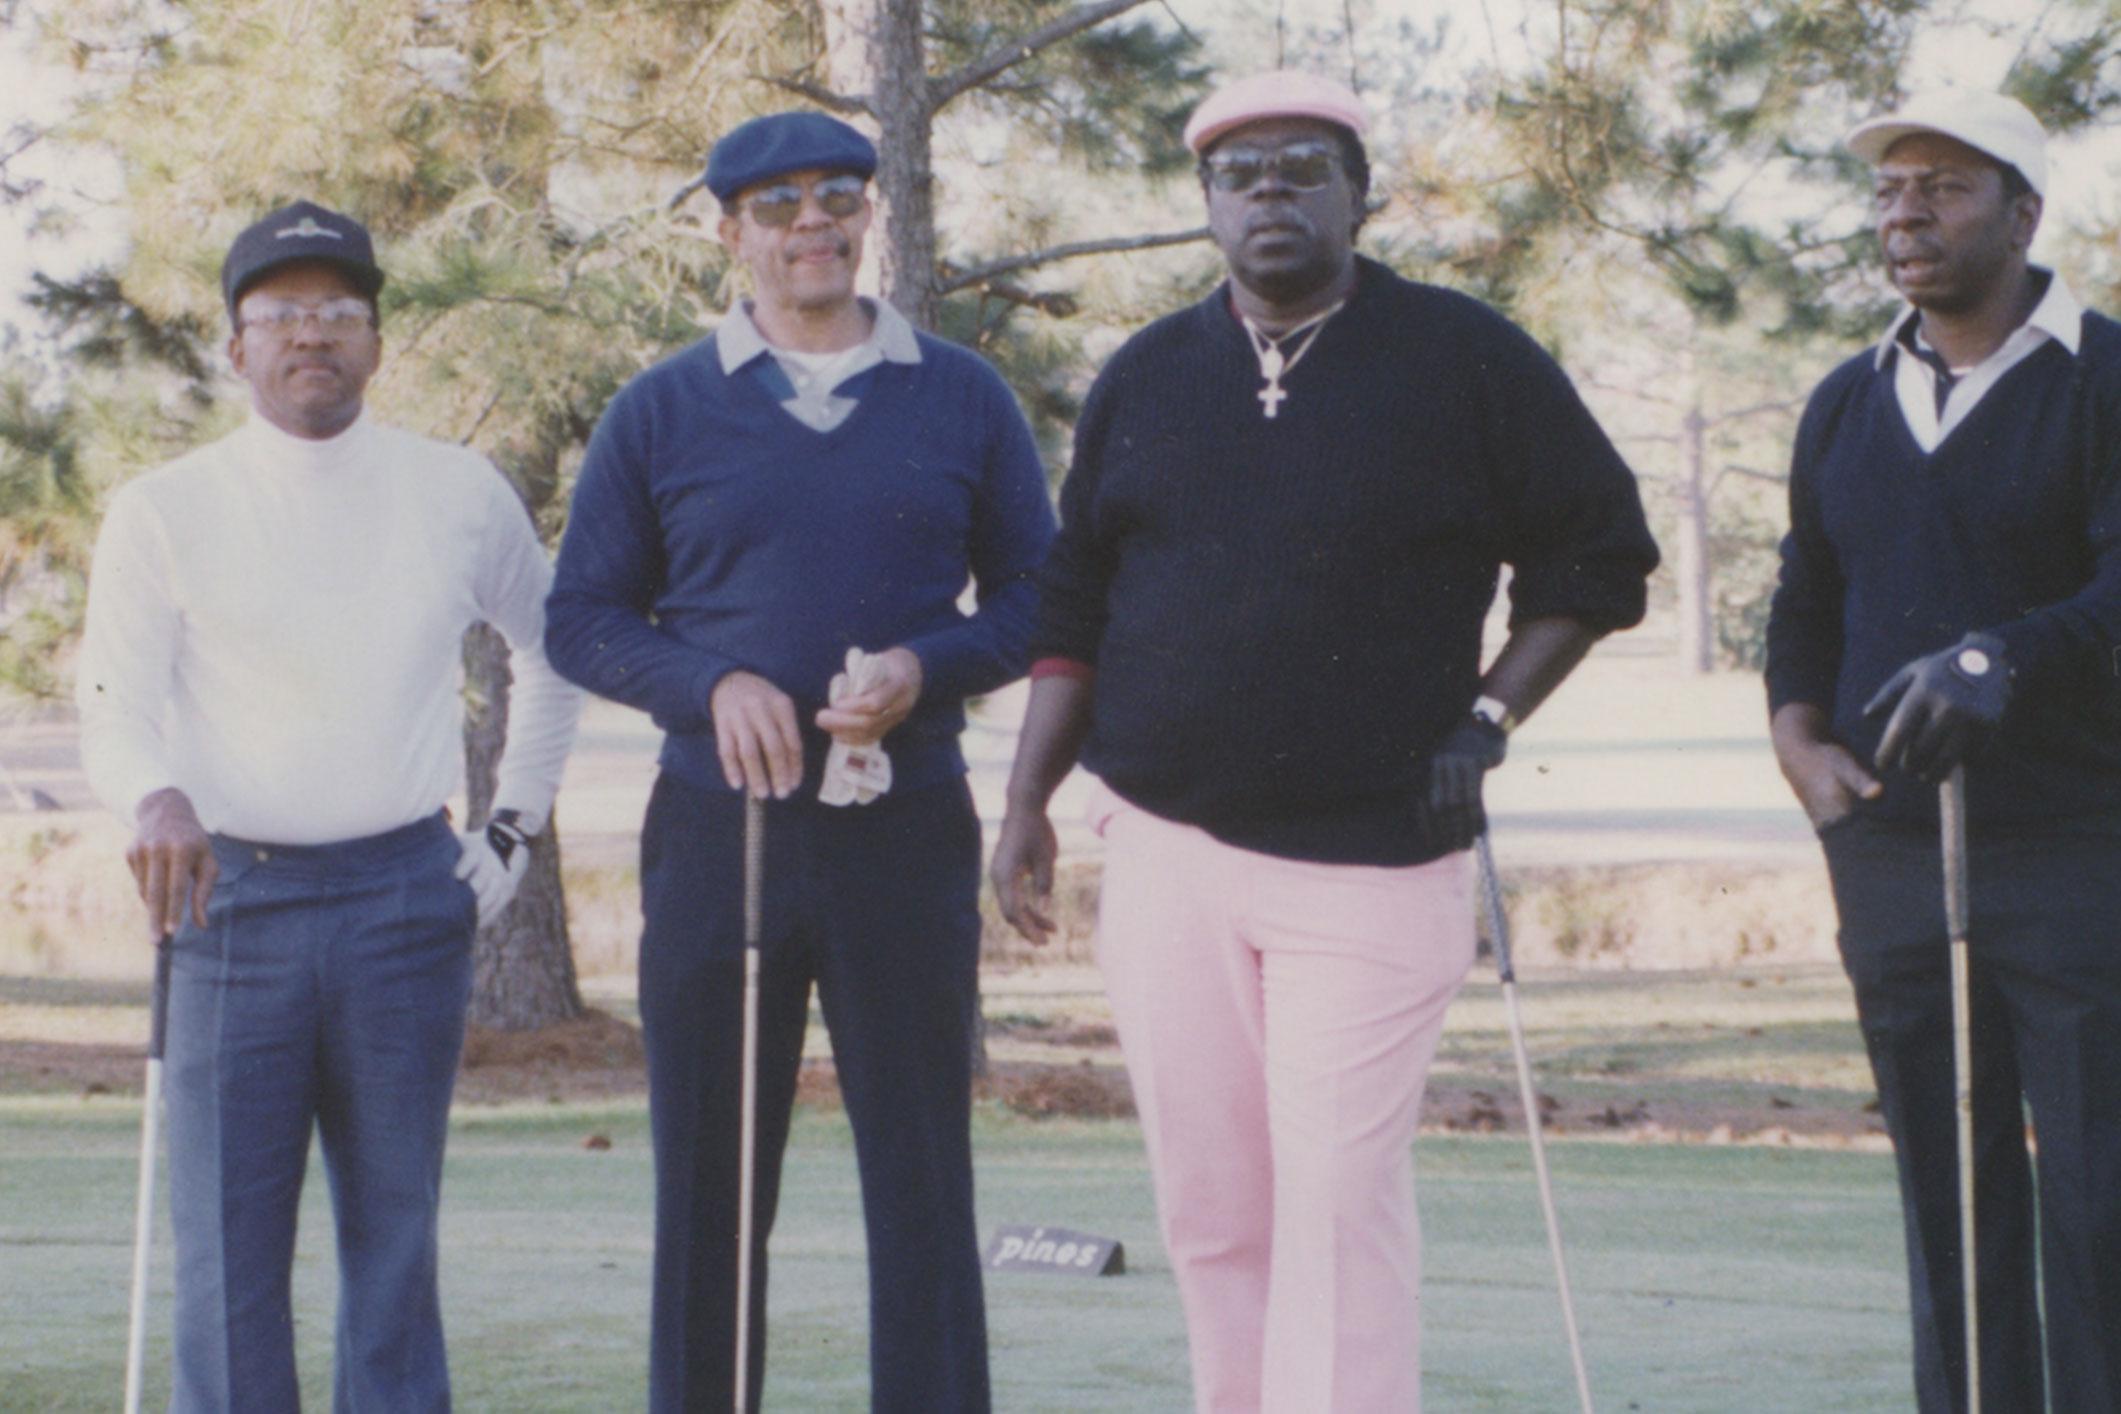 Muni Golf